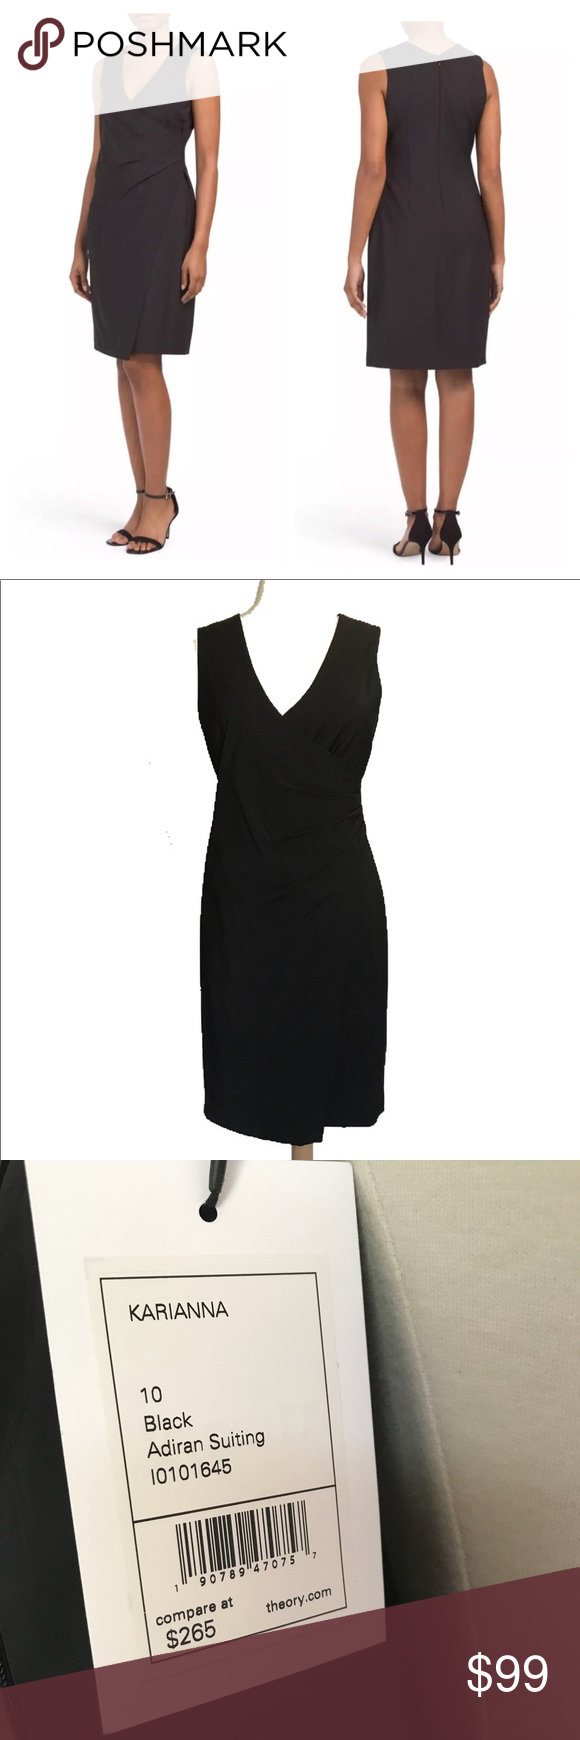 New THEORY Black Adiran Suiting Karianna Dress